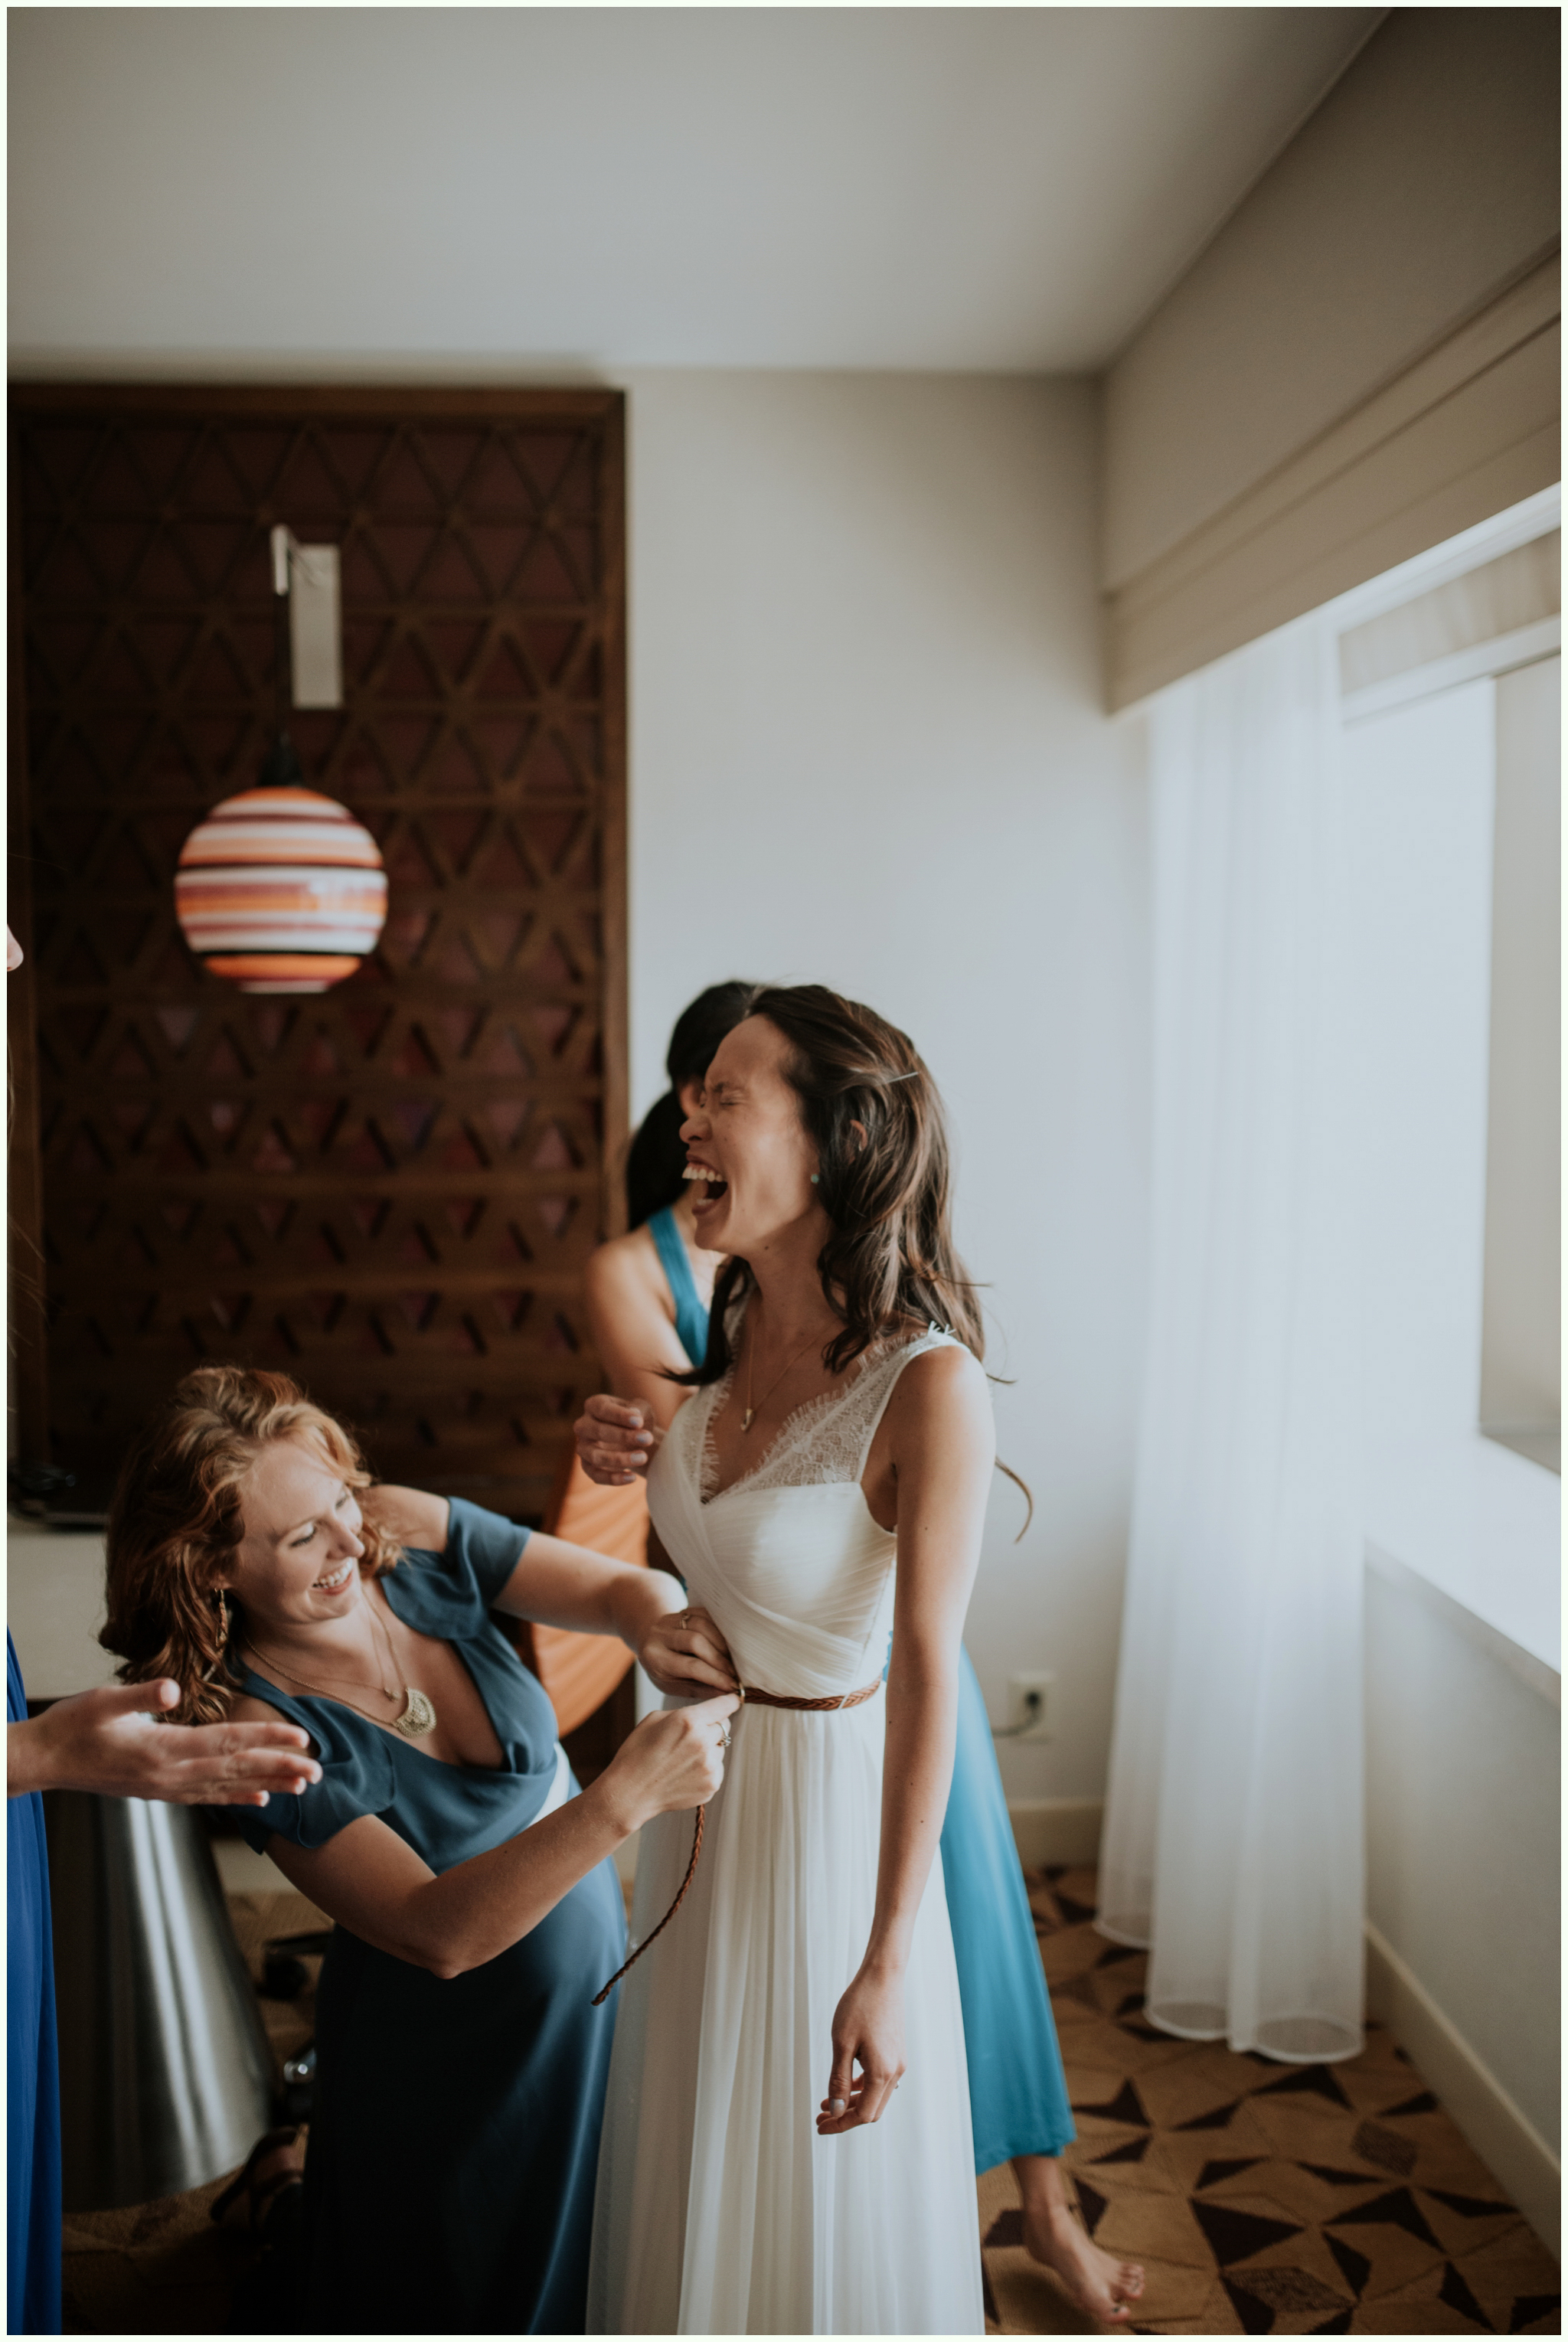 within-sodo-june-wedding-seattle-photographer-caitlyn-nikula-26.jpg